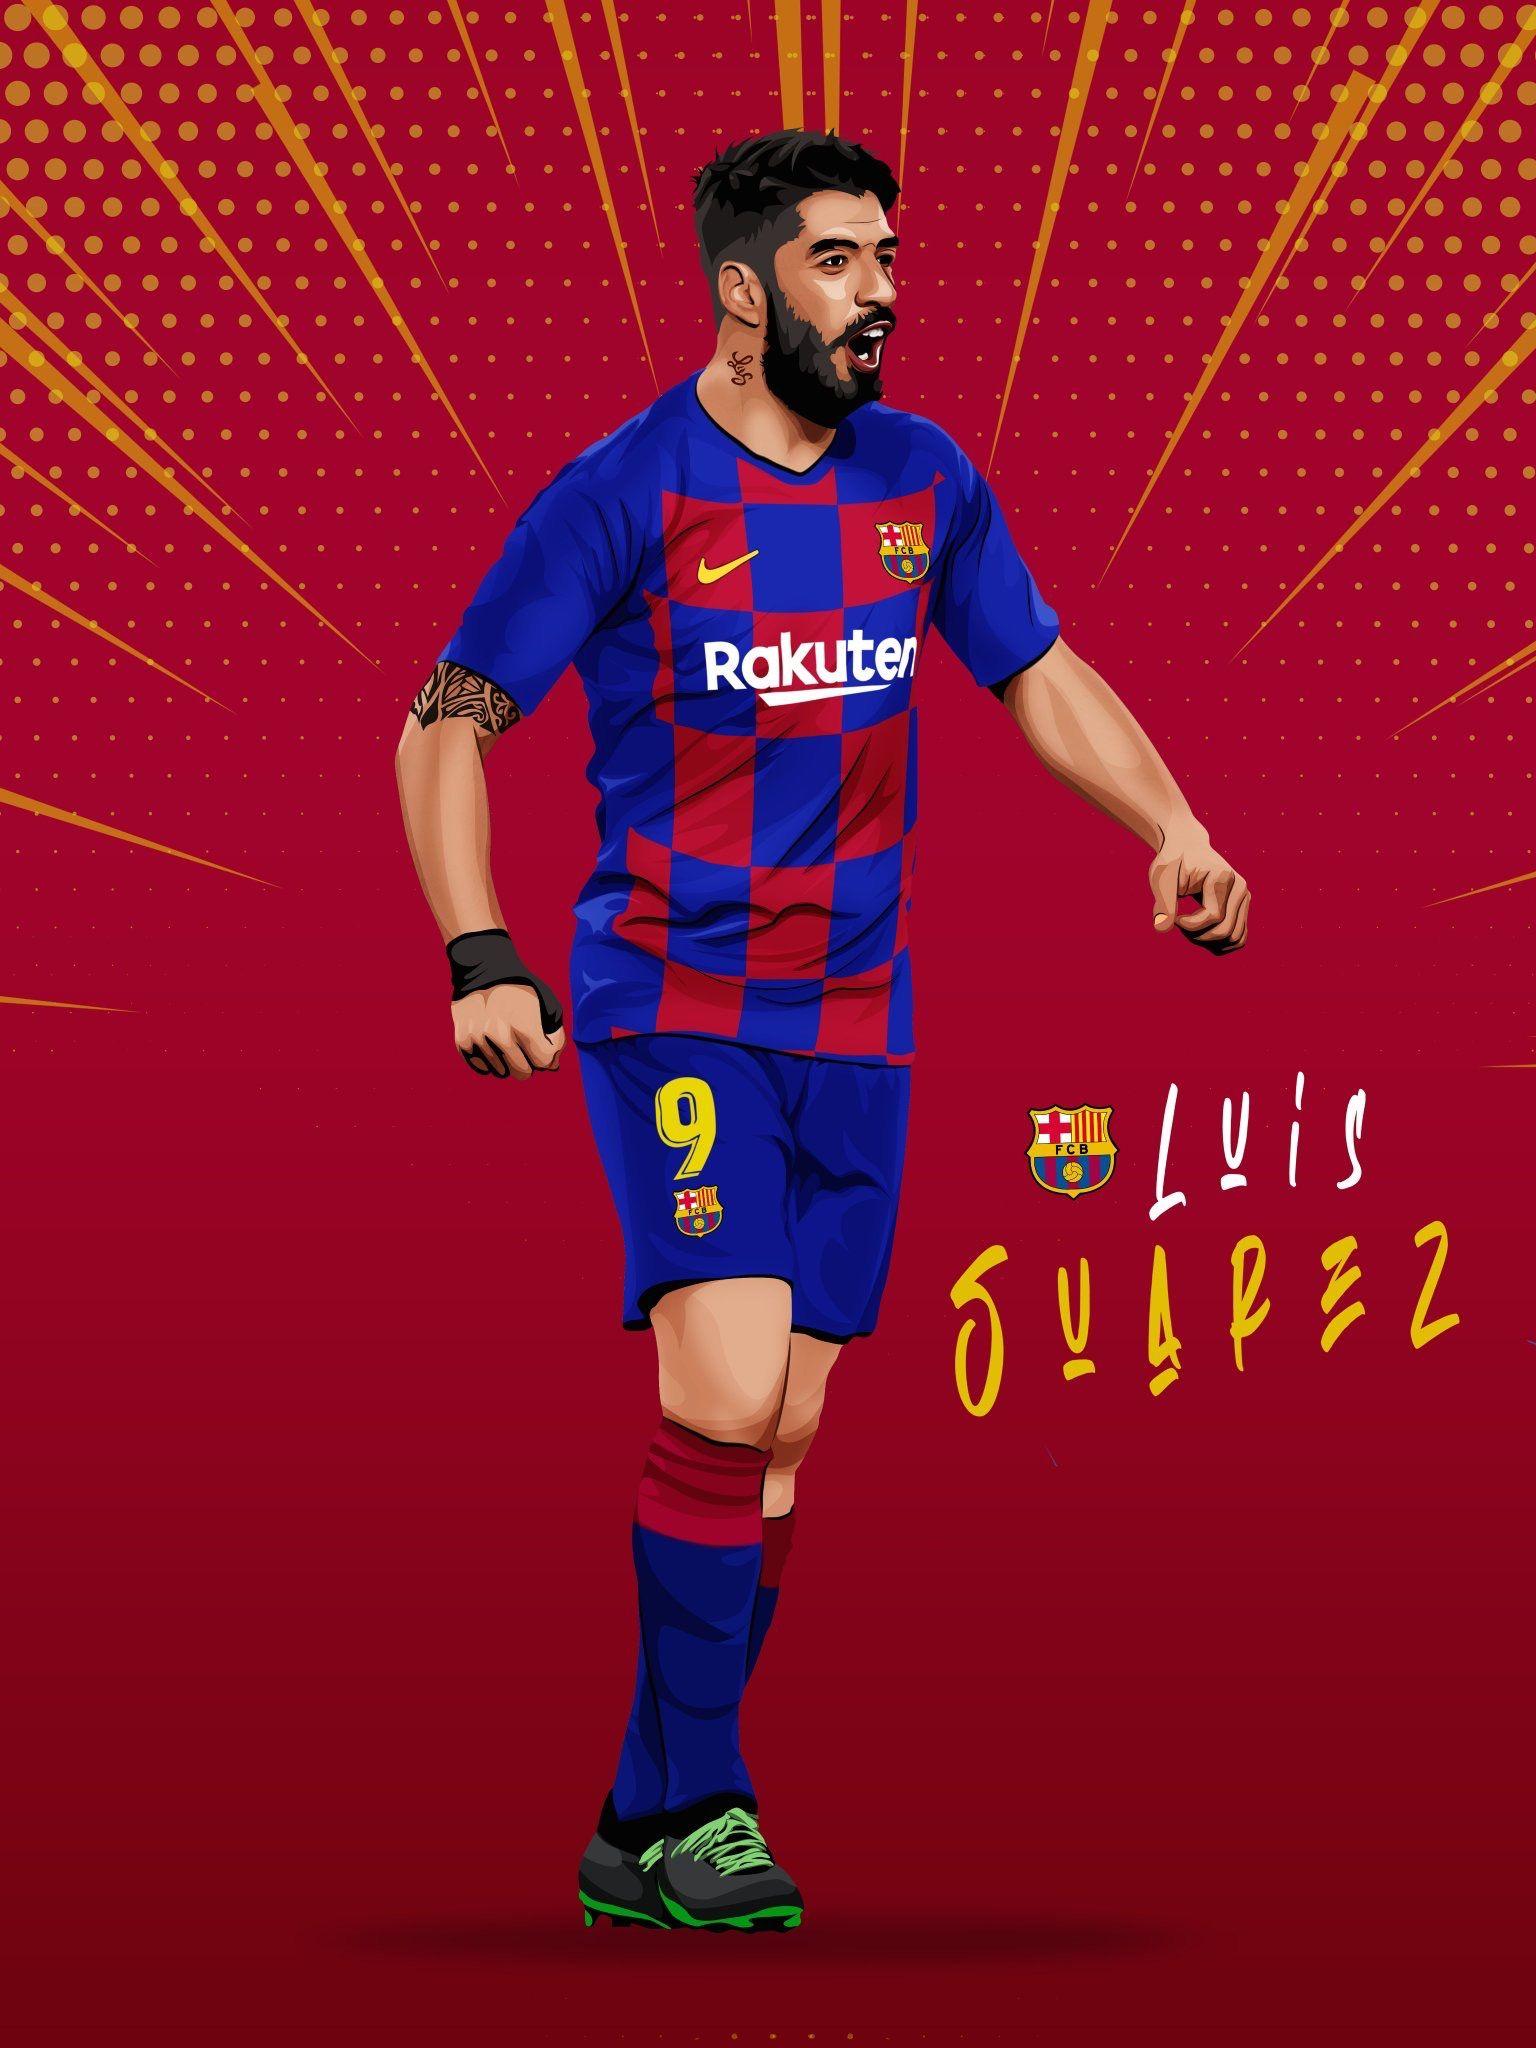 Pin De Alexis En Barcelona Illustration Futbol De Barcelona Jugadores De Futbol Visca Barca